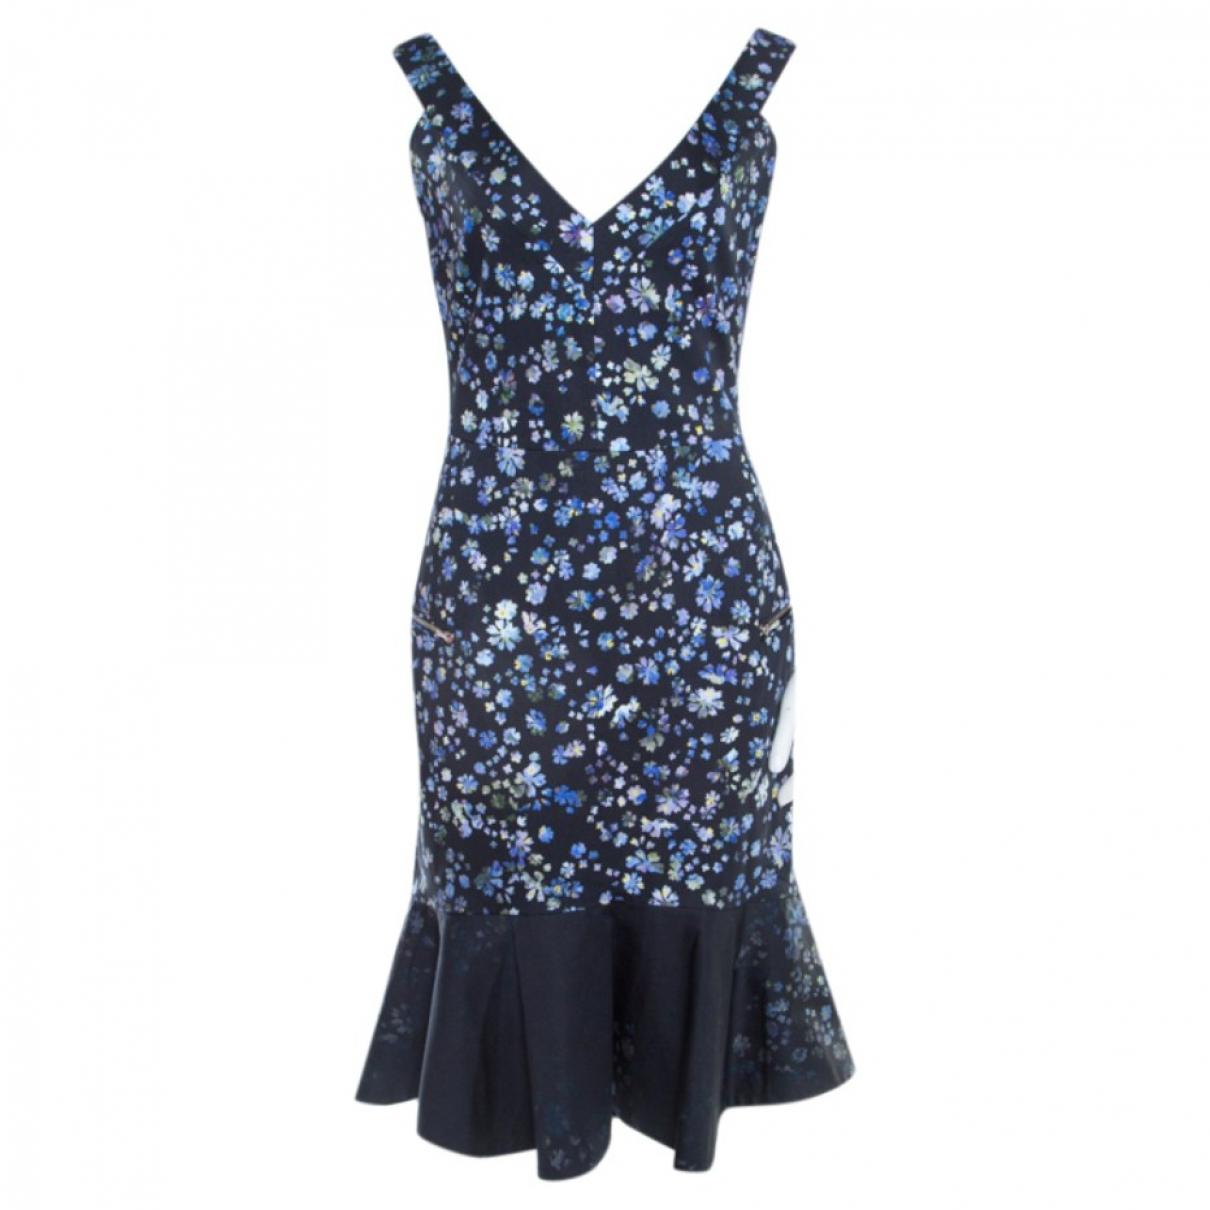 Preen By Thornton Bregazzi \N Blue Cotton dress for Women S International